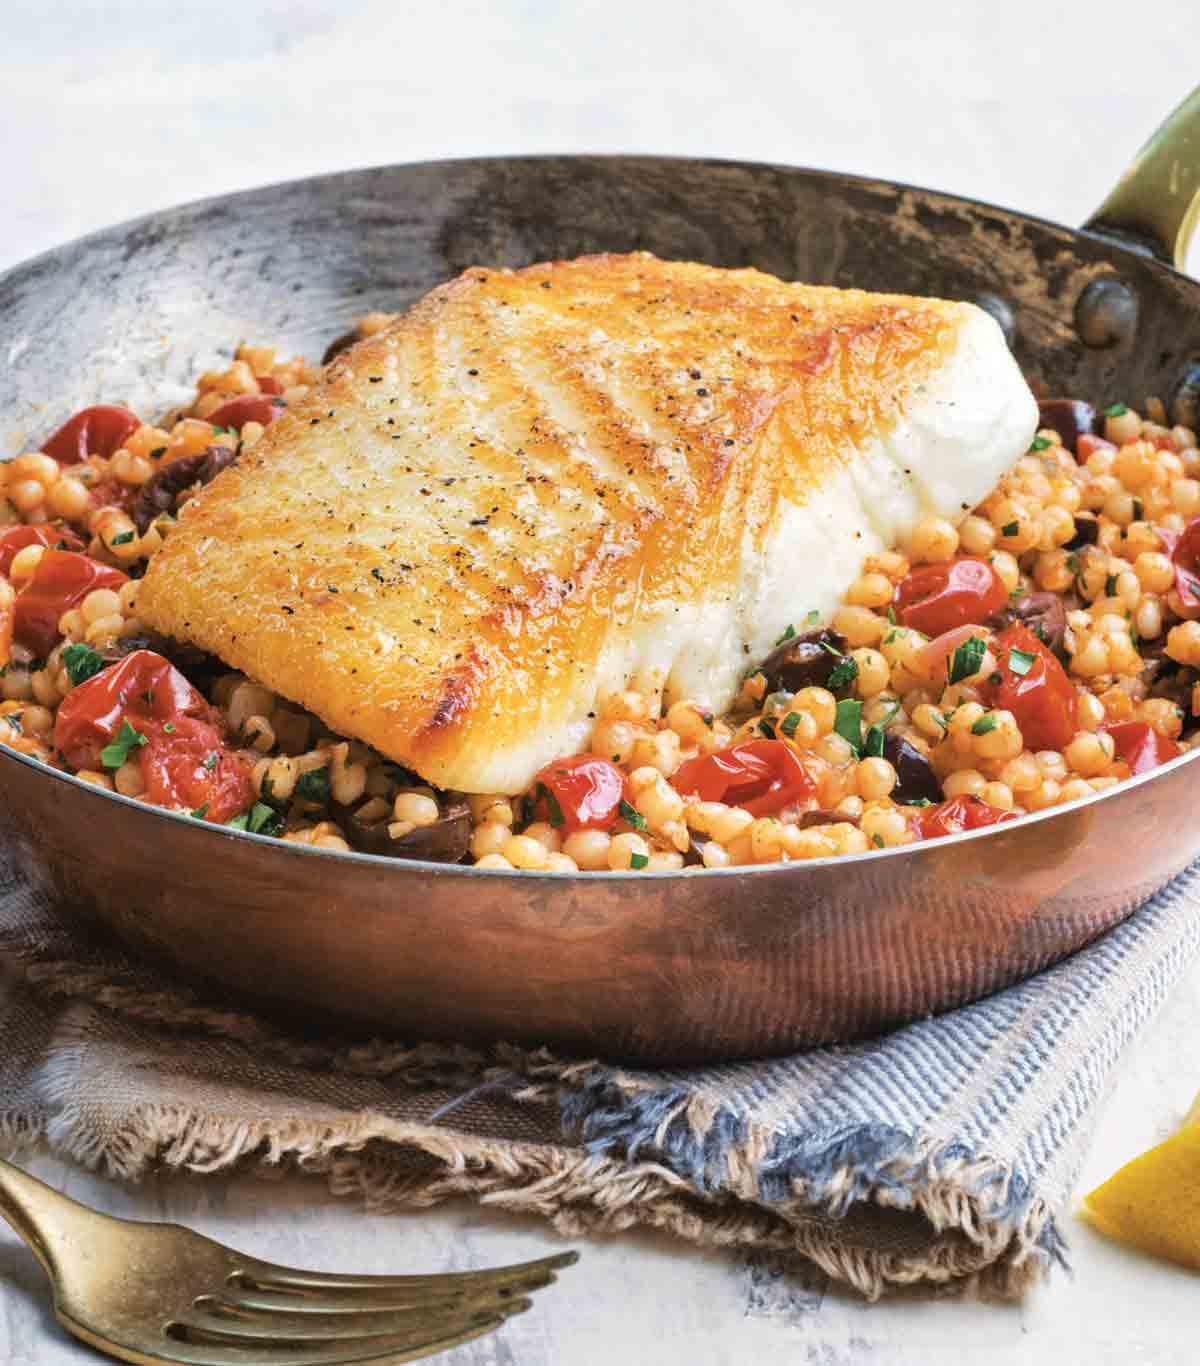 Fish recipe from Jessica's cookbook